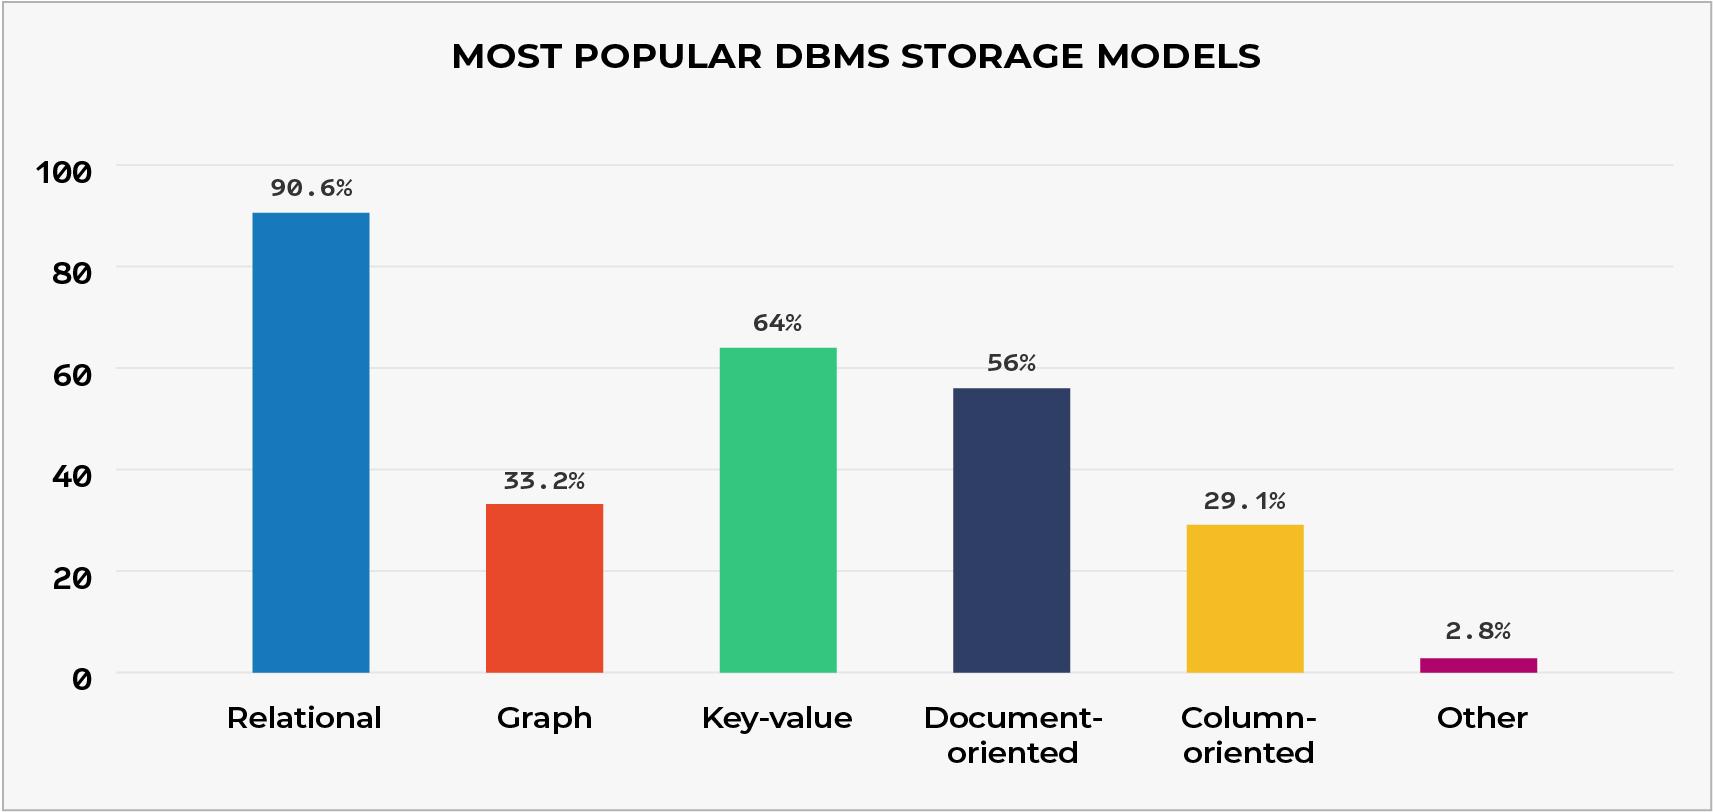 Most Popular DBMS Storage Models